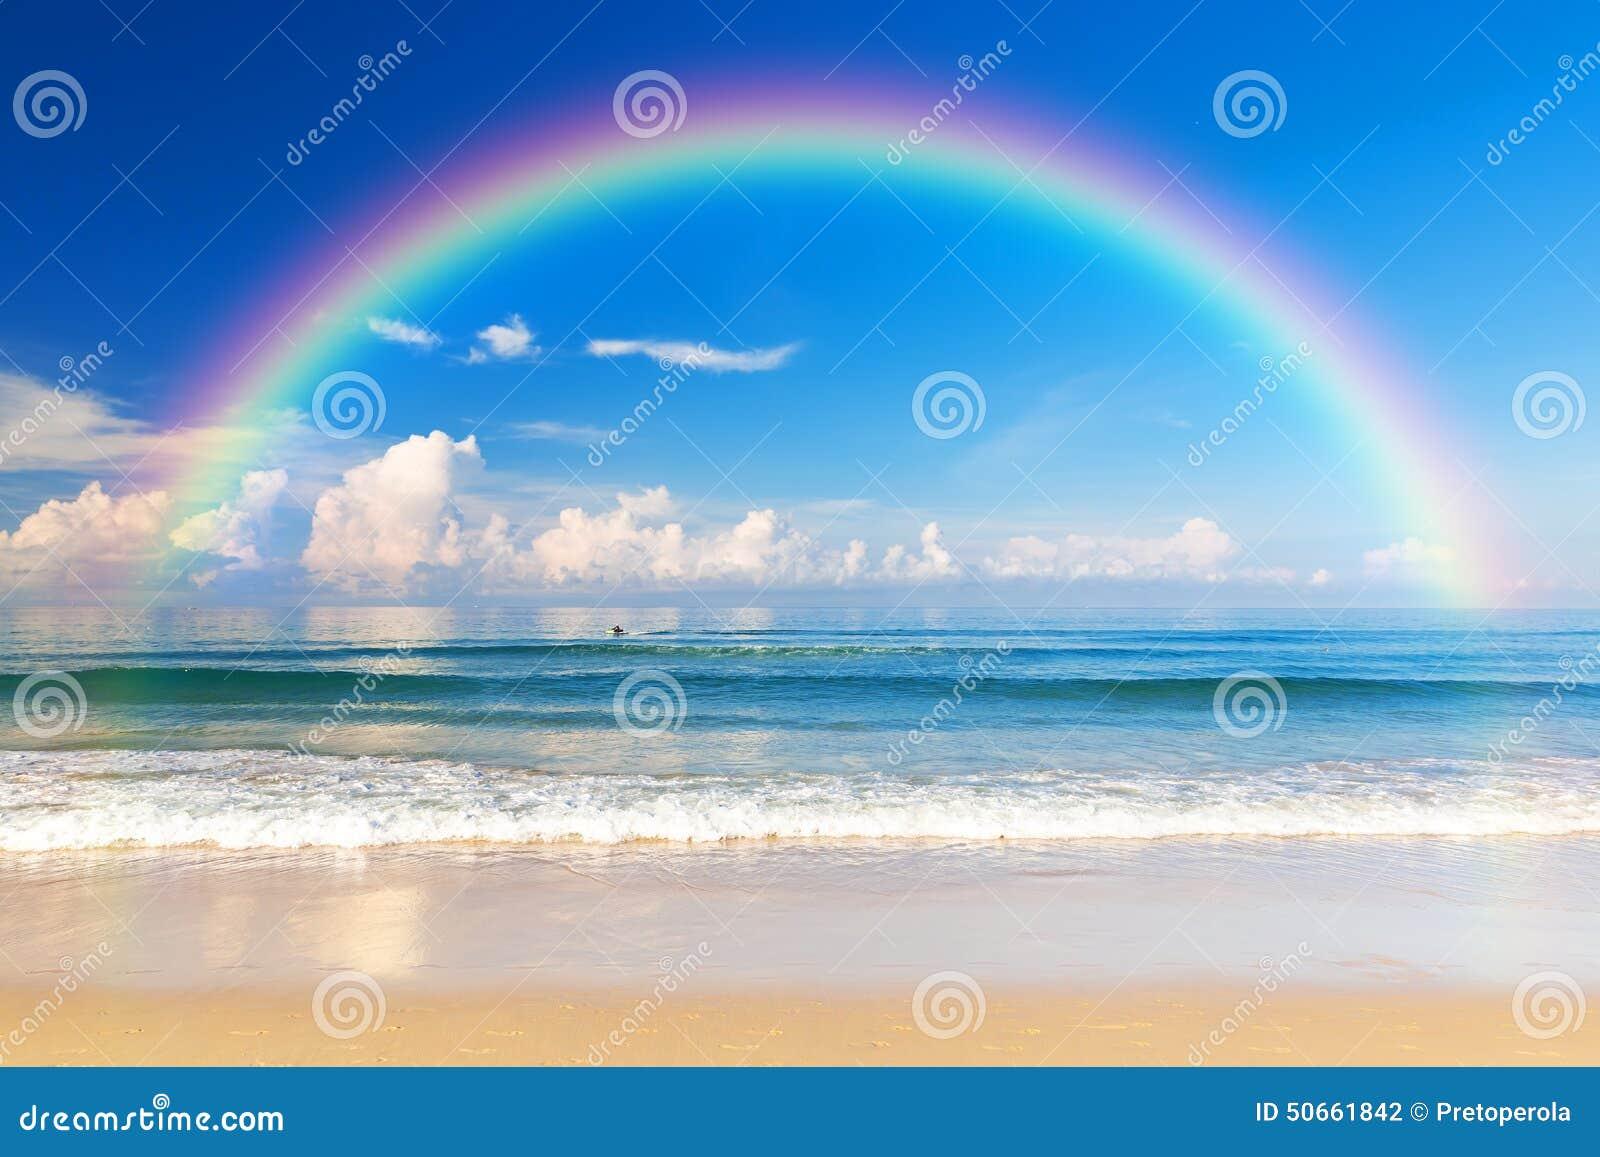 Bello mare con un arcobaleno nel cielo